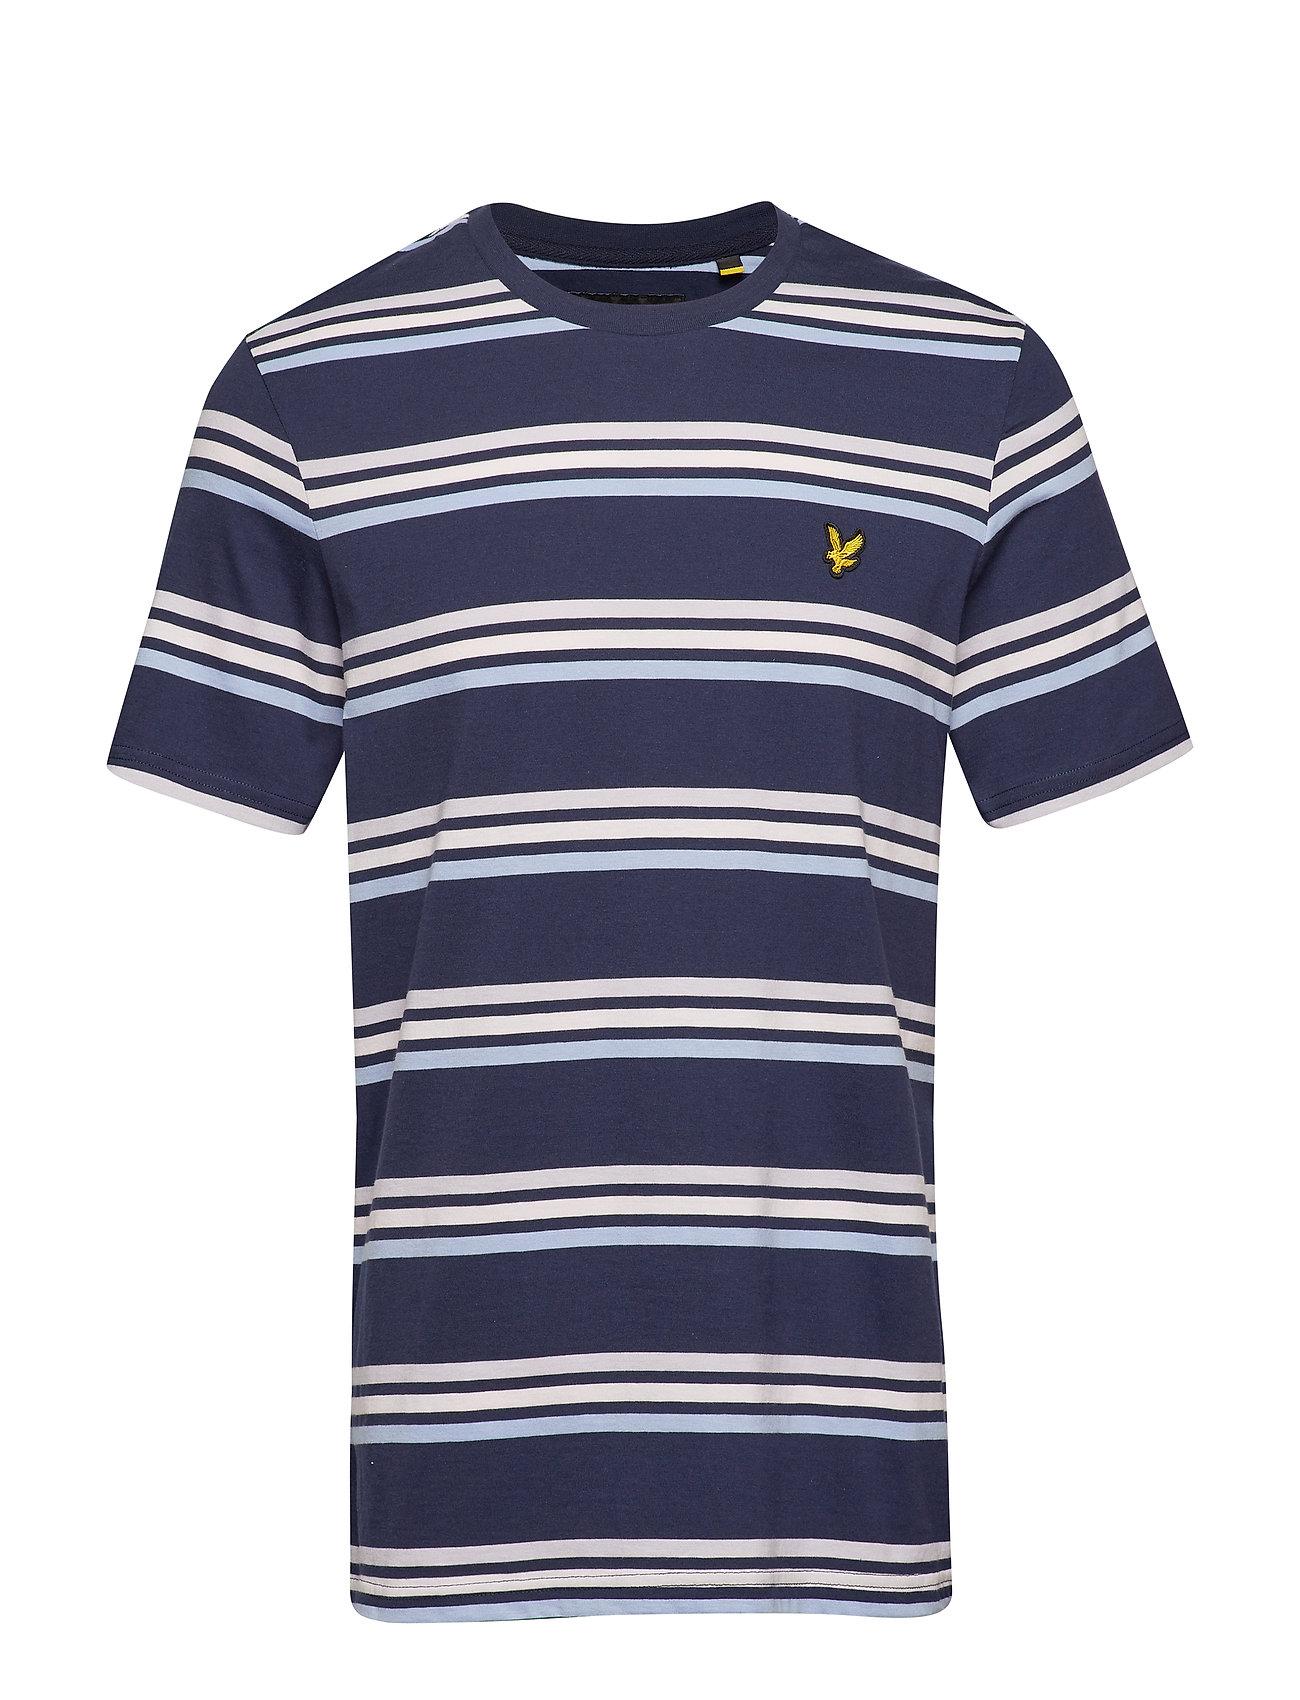 Lyle & Scott Multi Stripe T-Shirt - NAVY